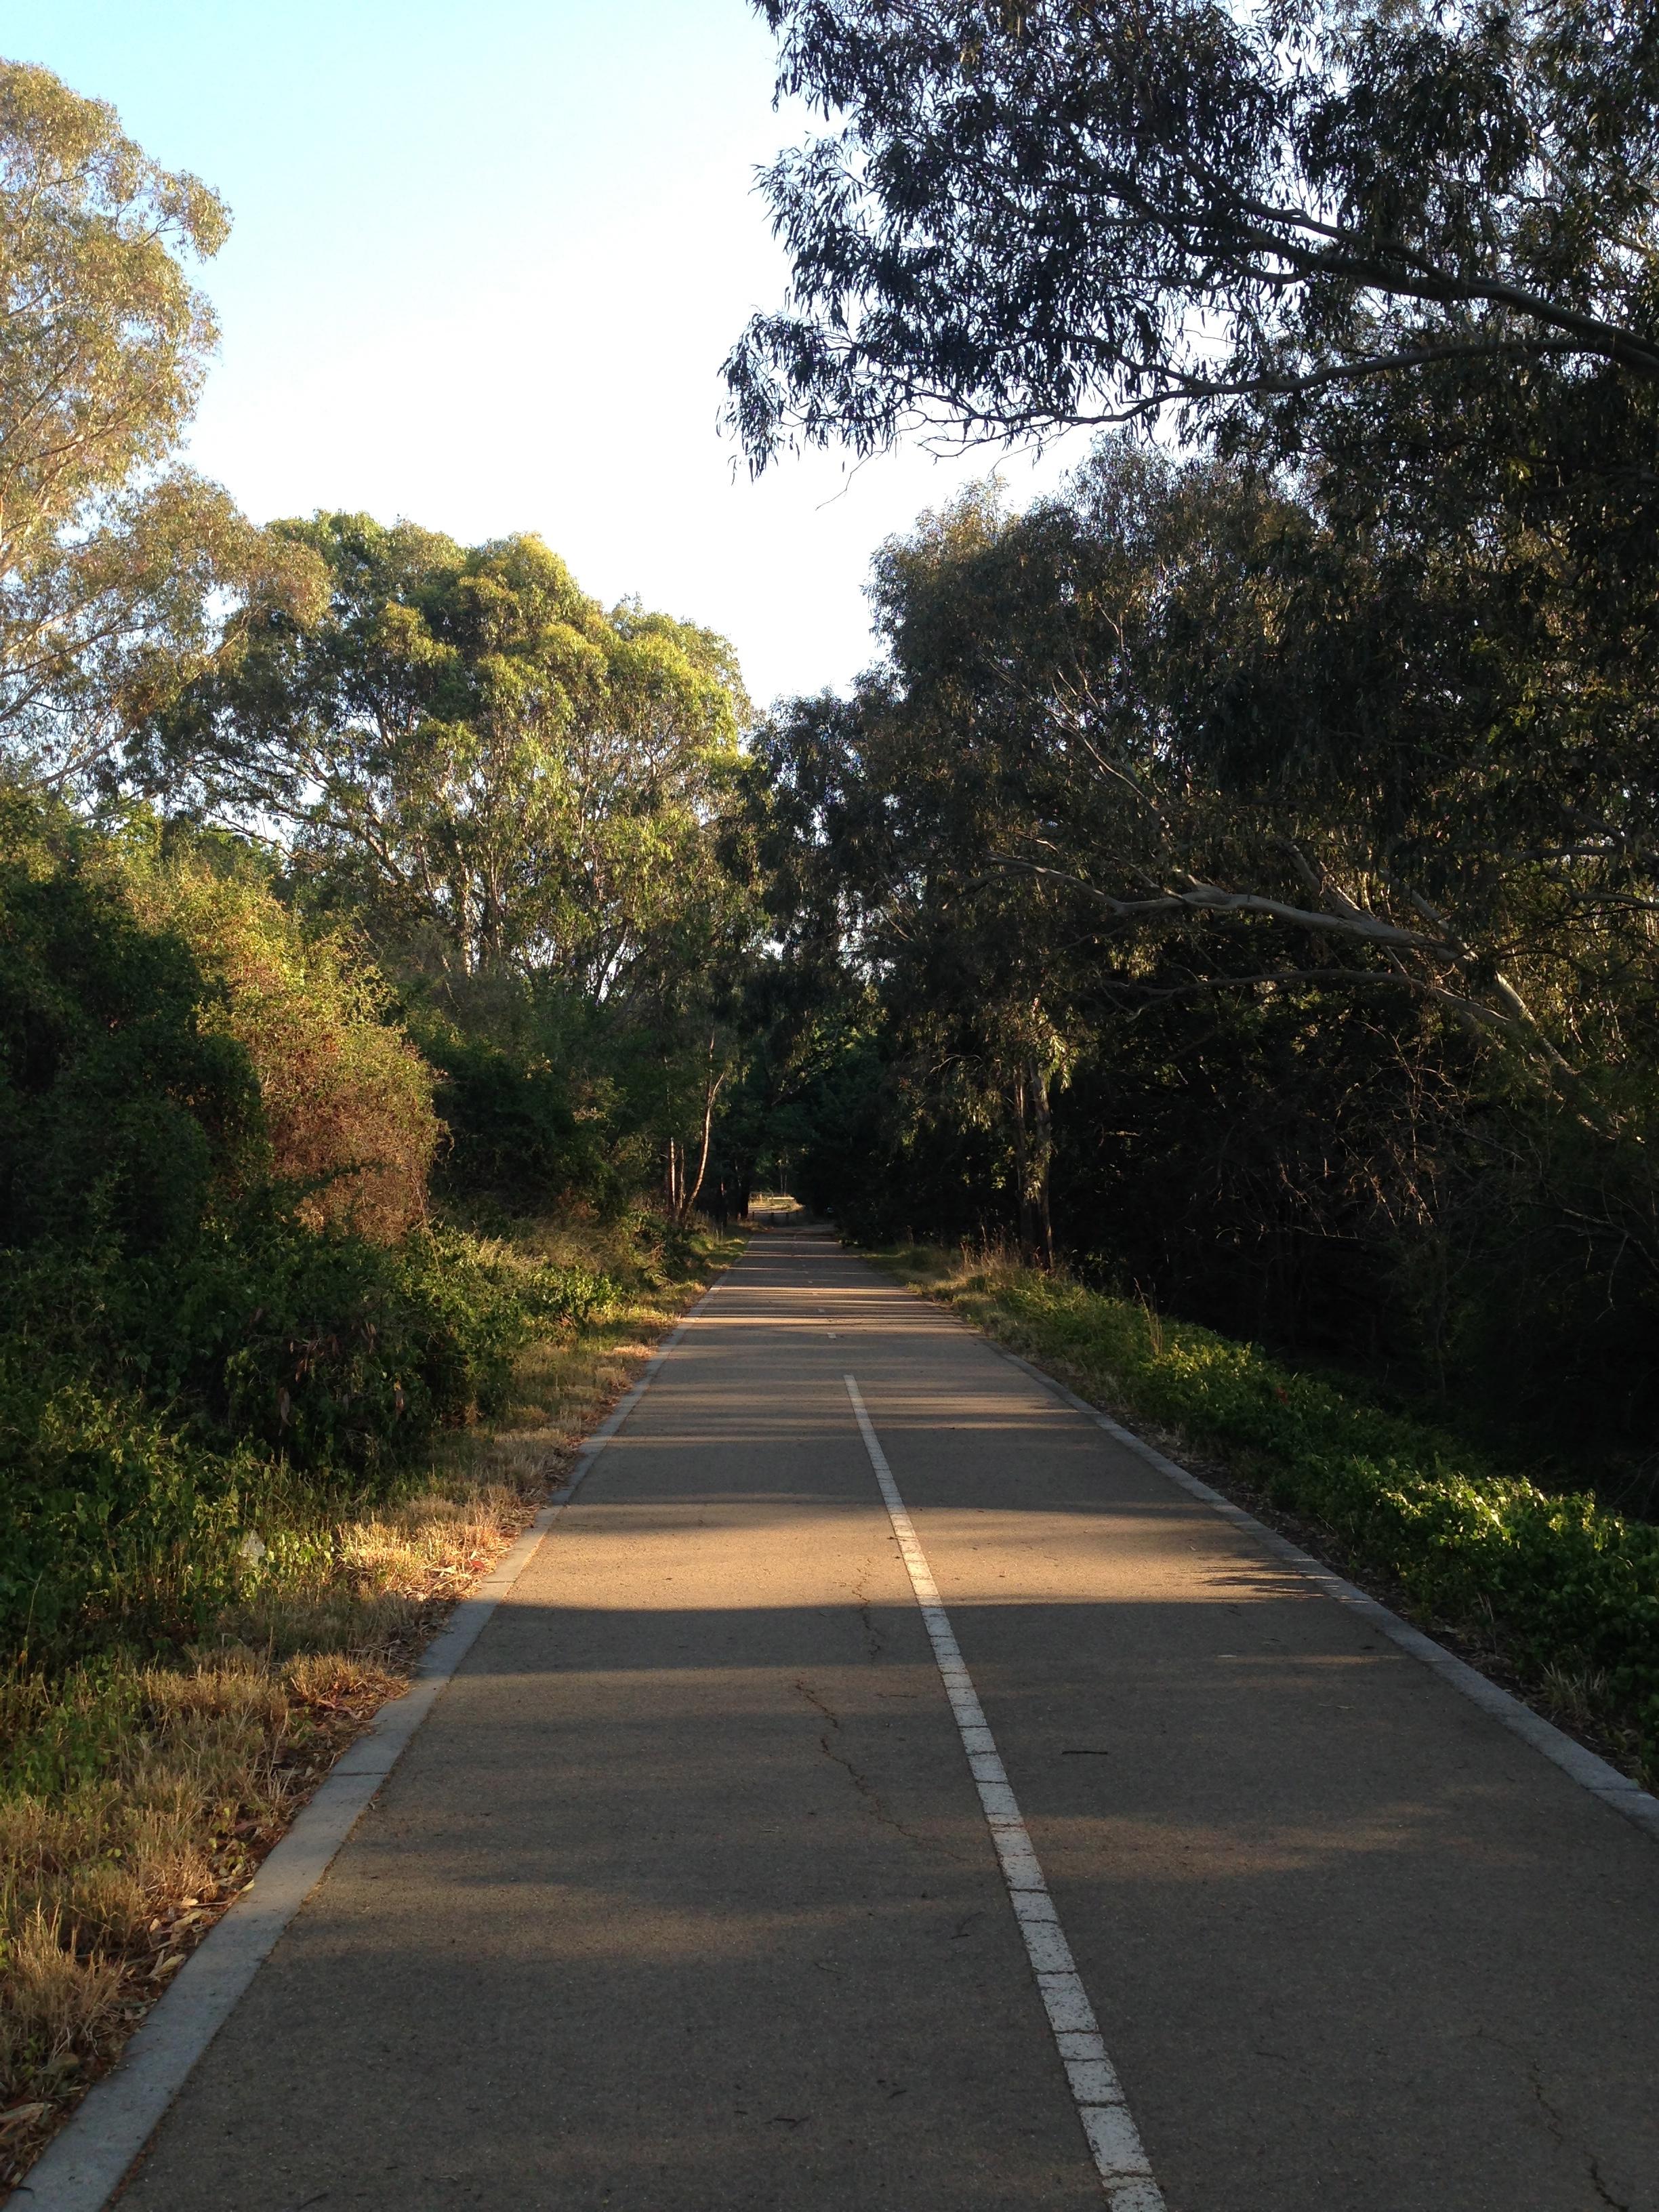 Main Yarra Trail, Yarra Flats Park, Melbourne.